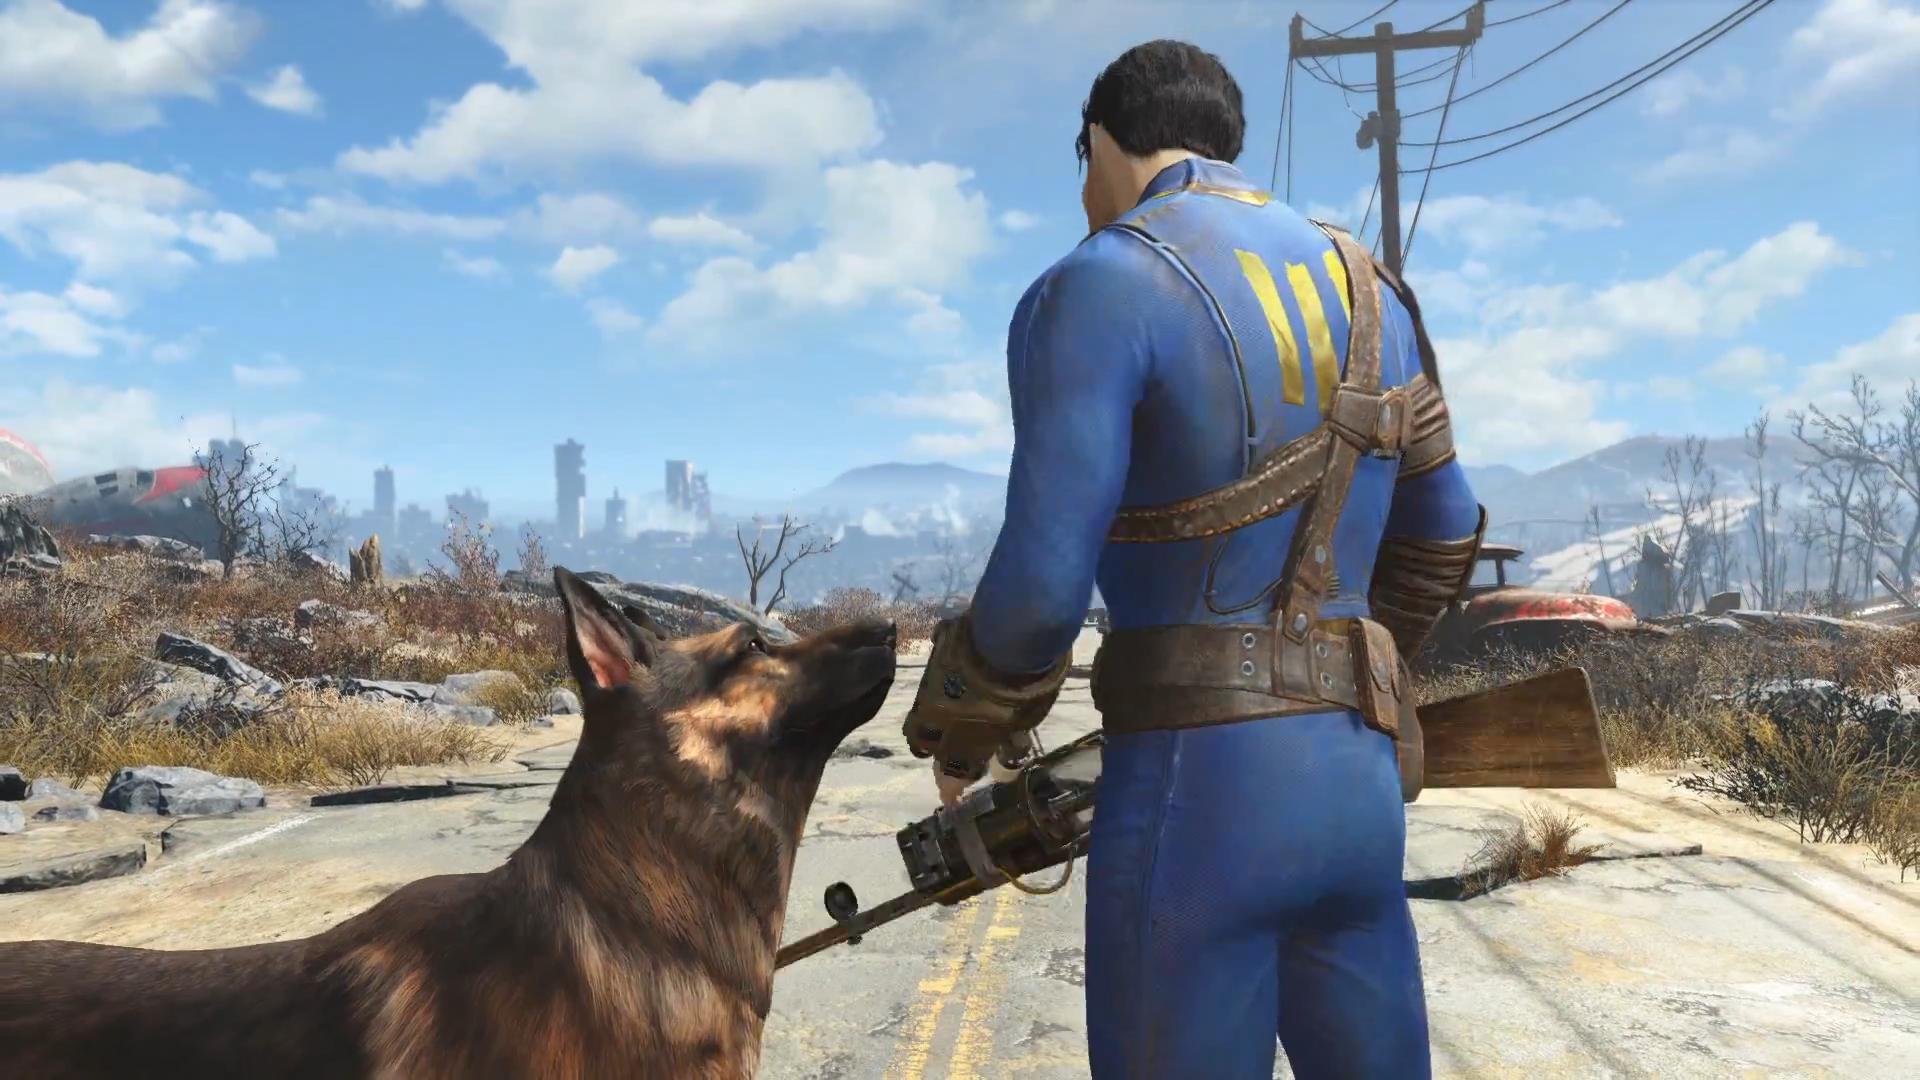 Image boston skyline from fallout wiki fandom powered by wikia - Fallout new vegas skyline ...